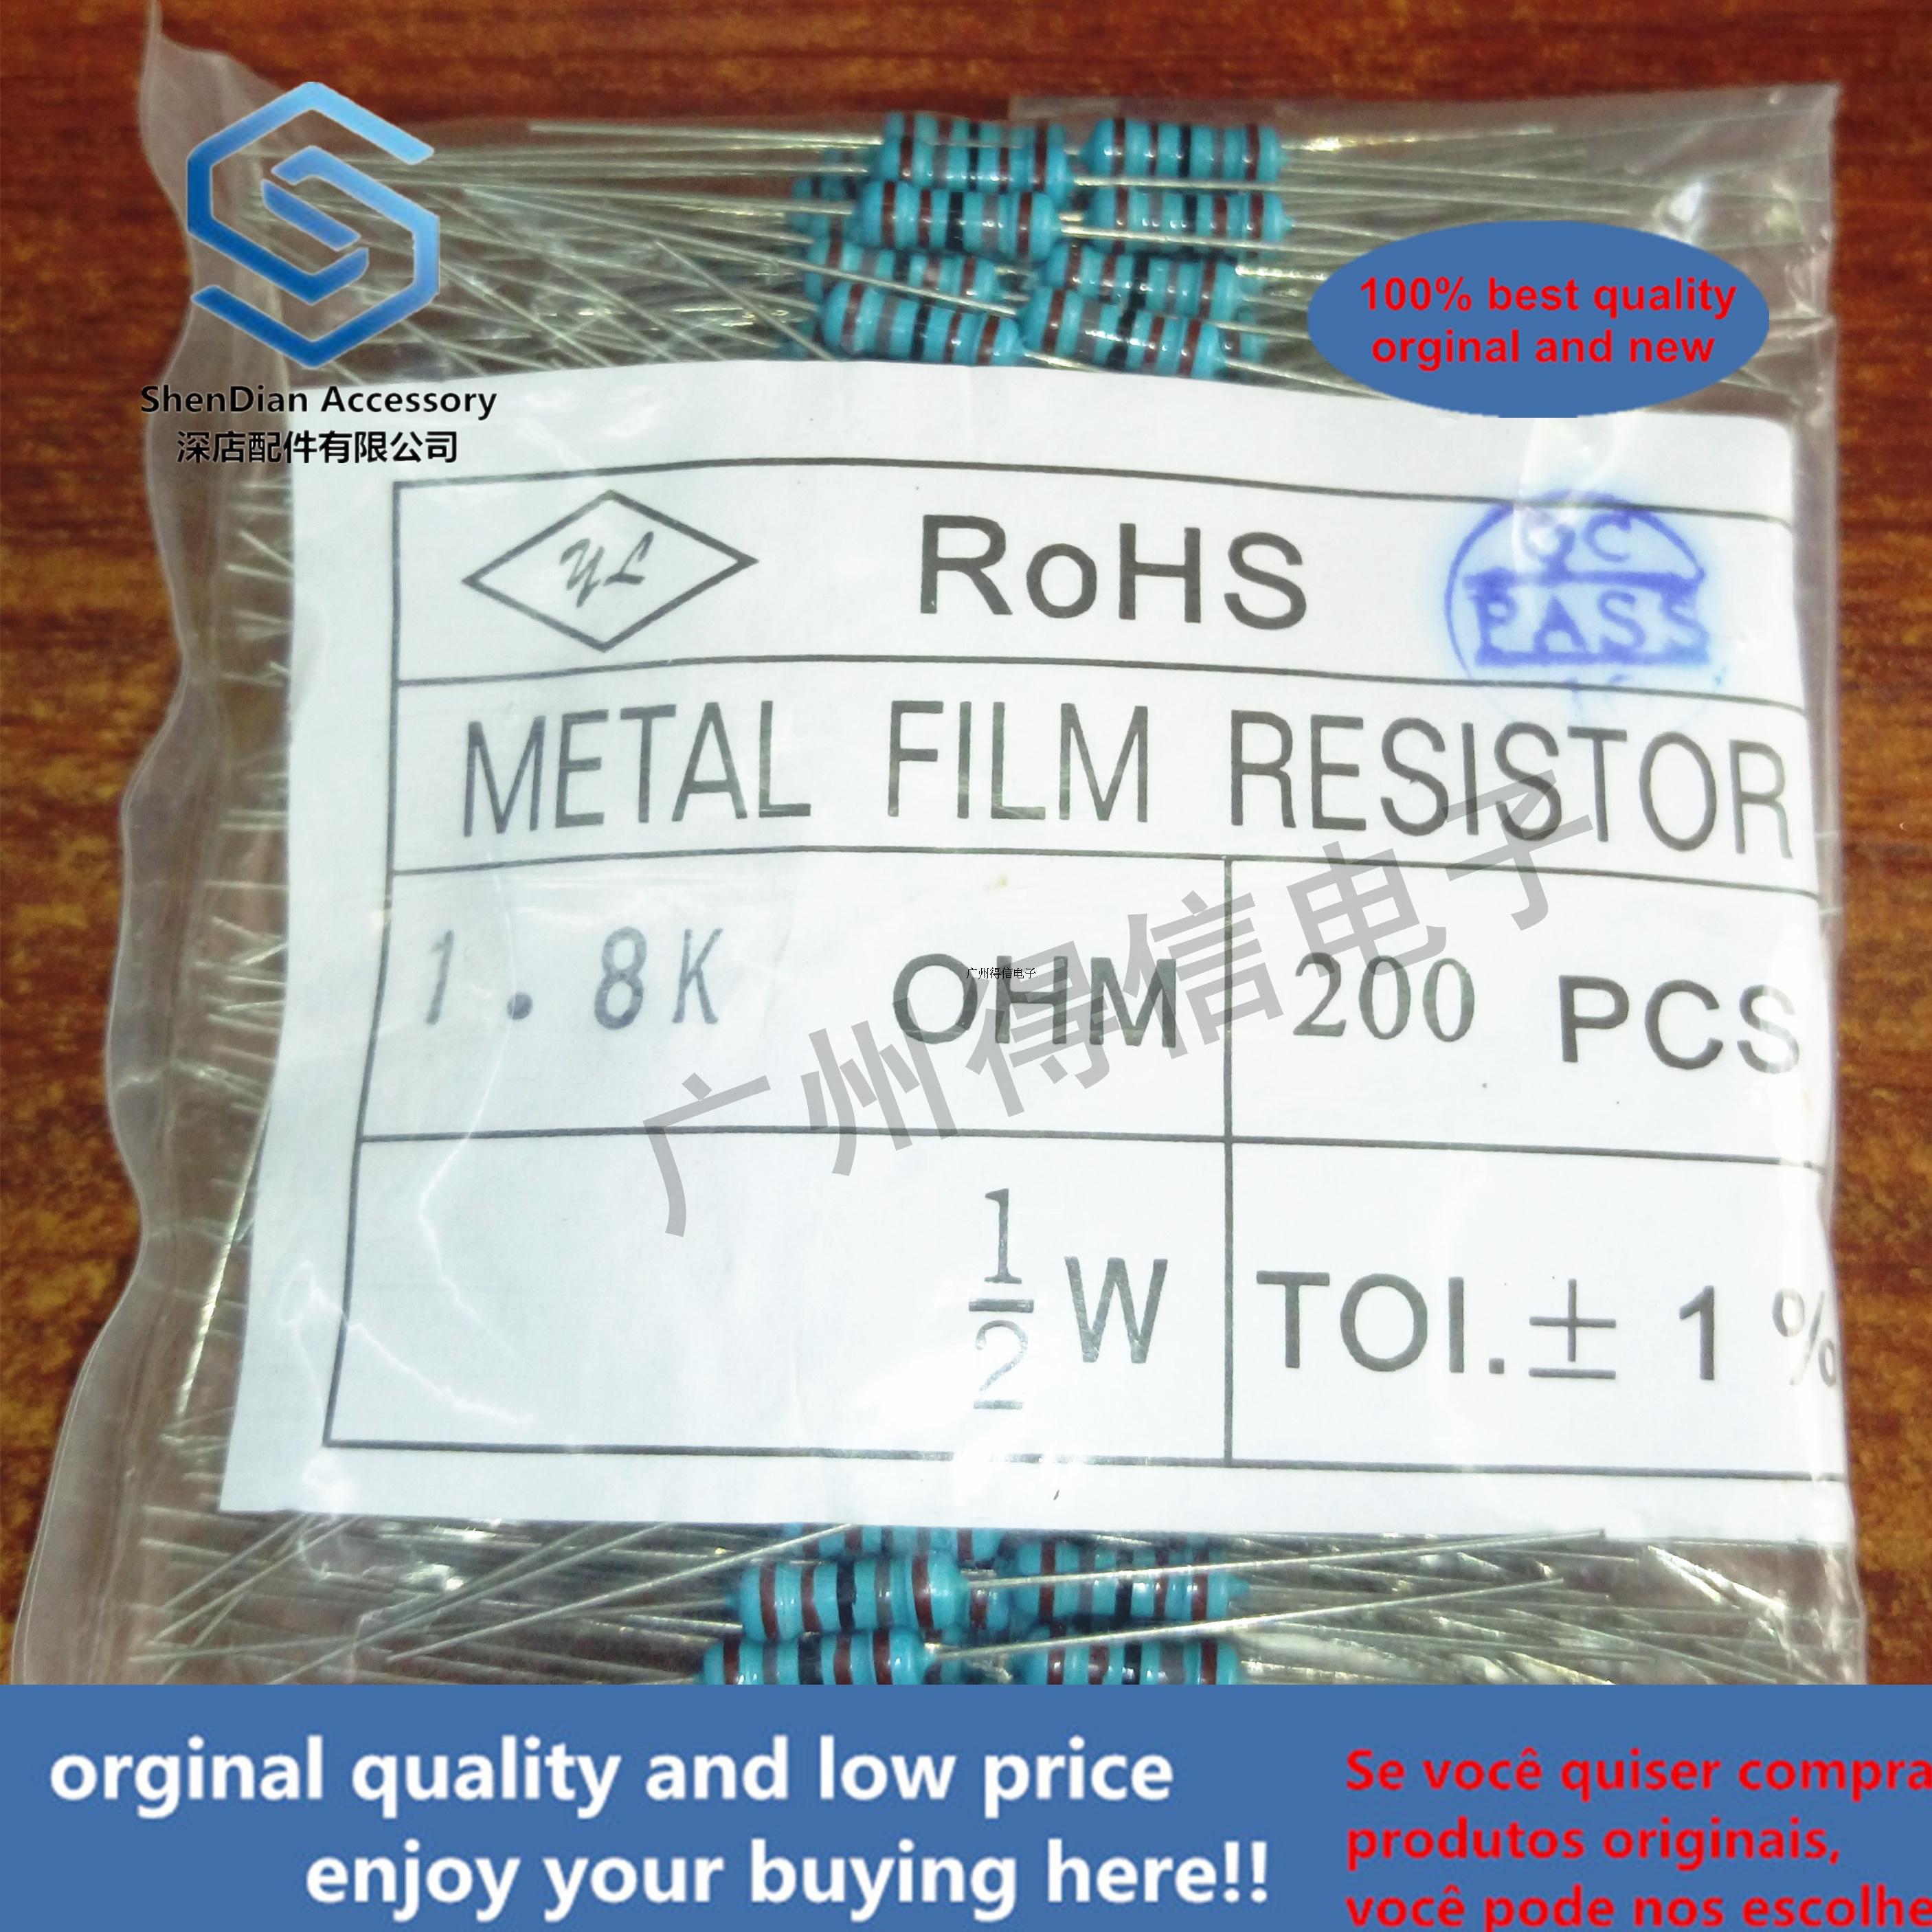 200pcs 1 / 2W 47K 1% Brand New Metal Film Iron Feet Resistor Bag 200 Pcs Per Pack